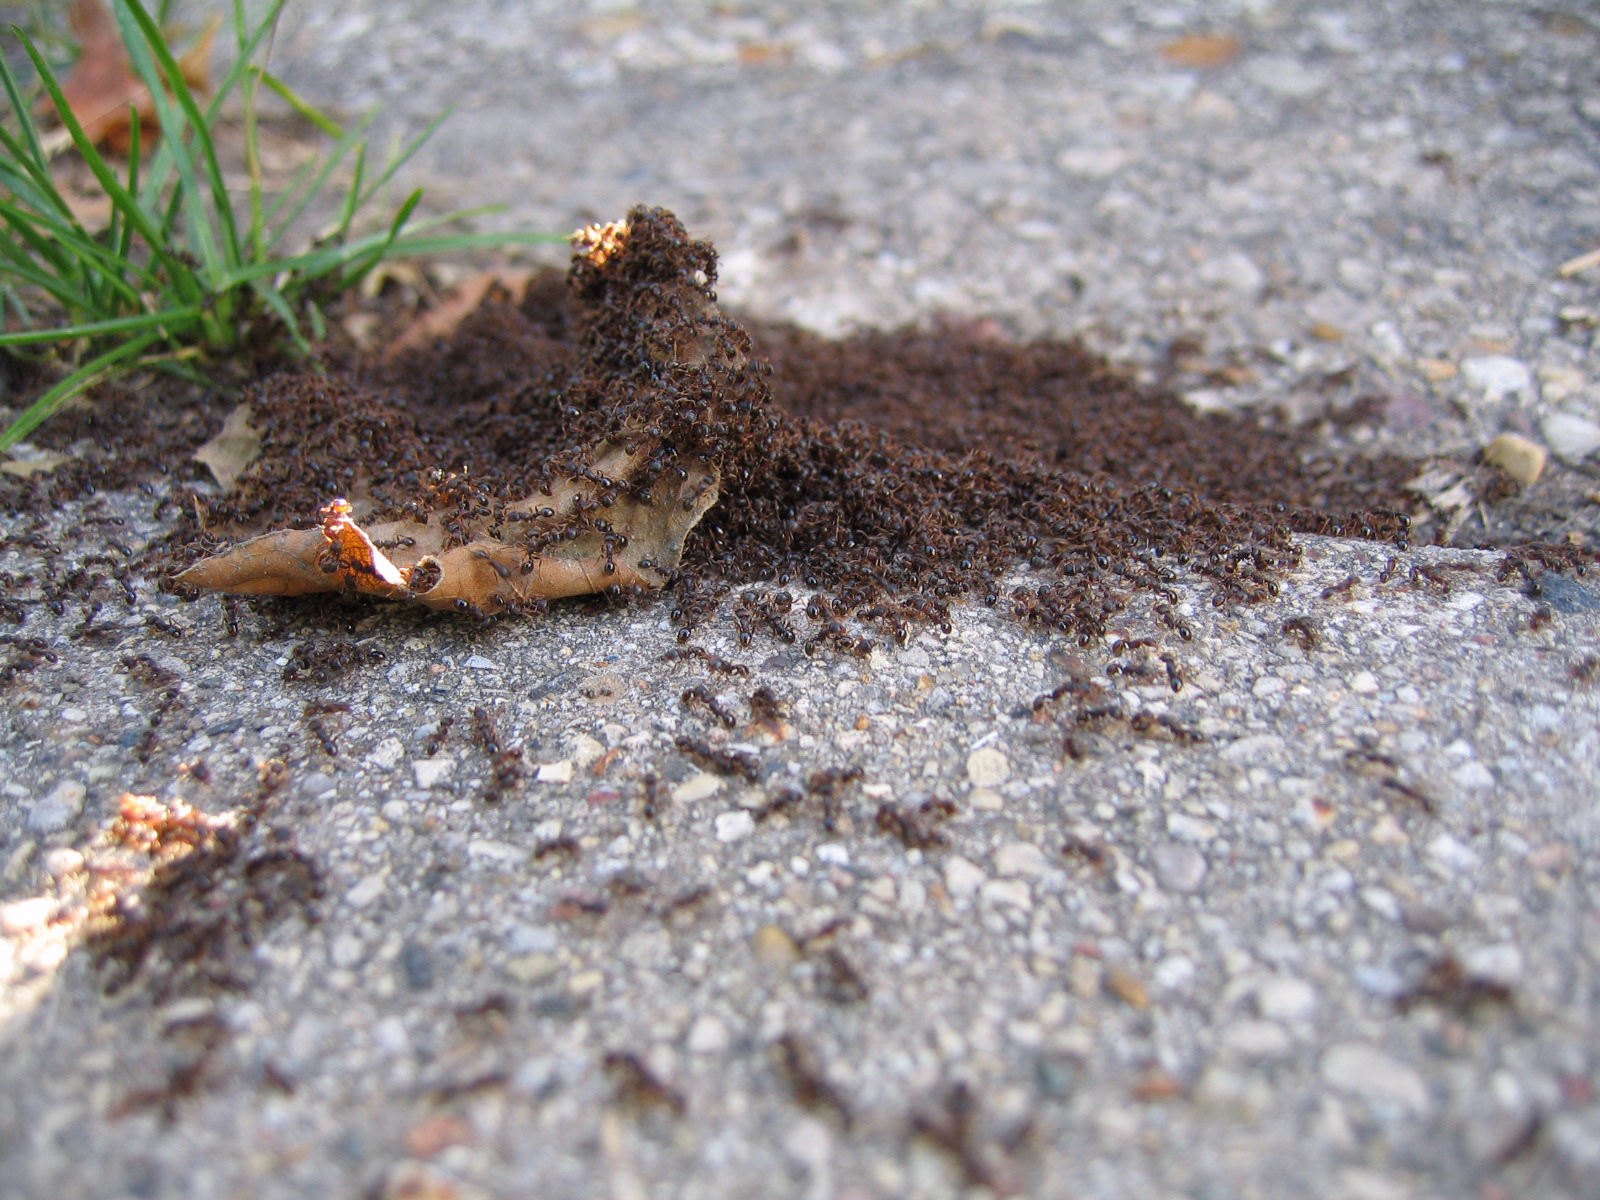 ants-invasion-1463097.jpg